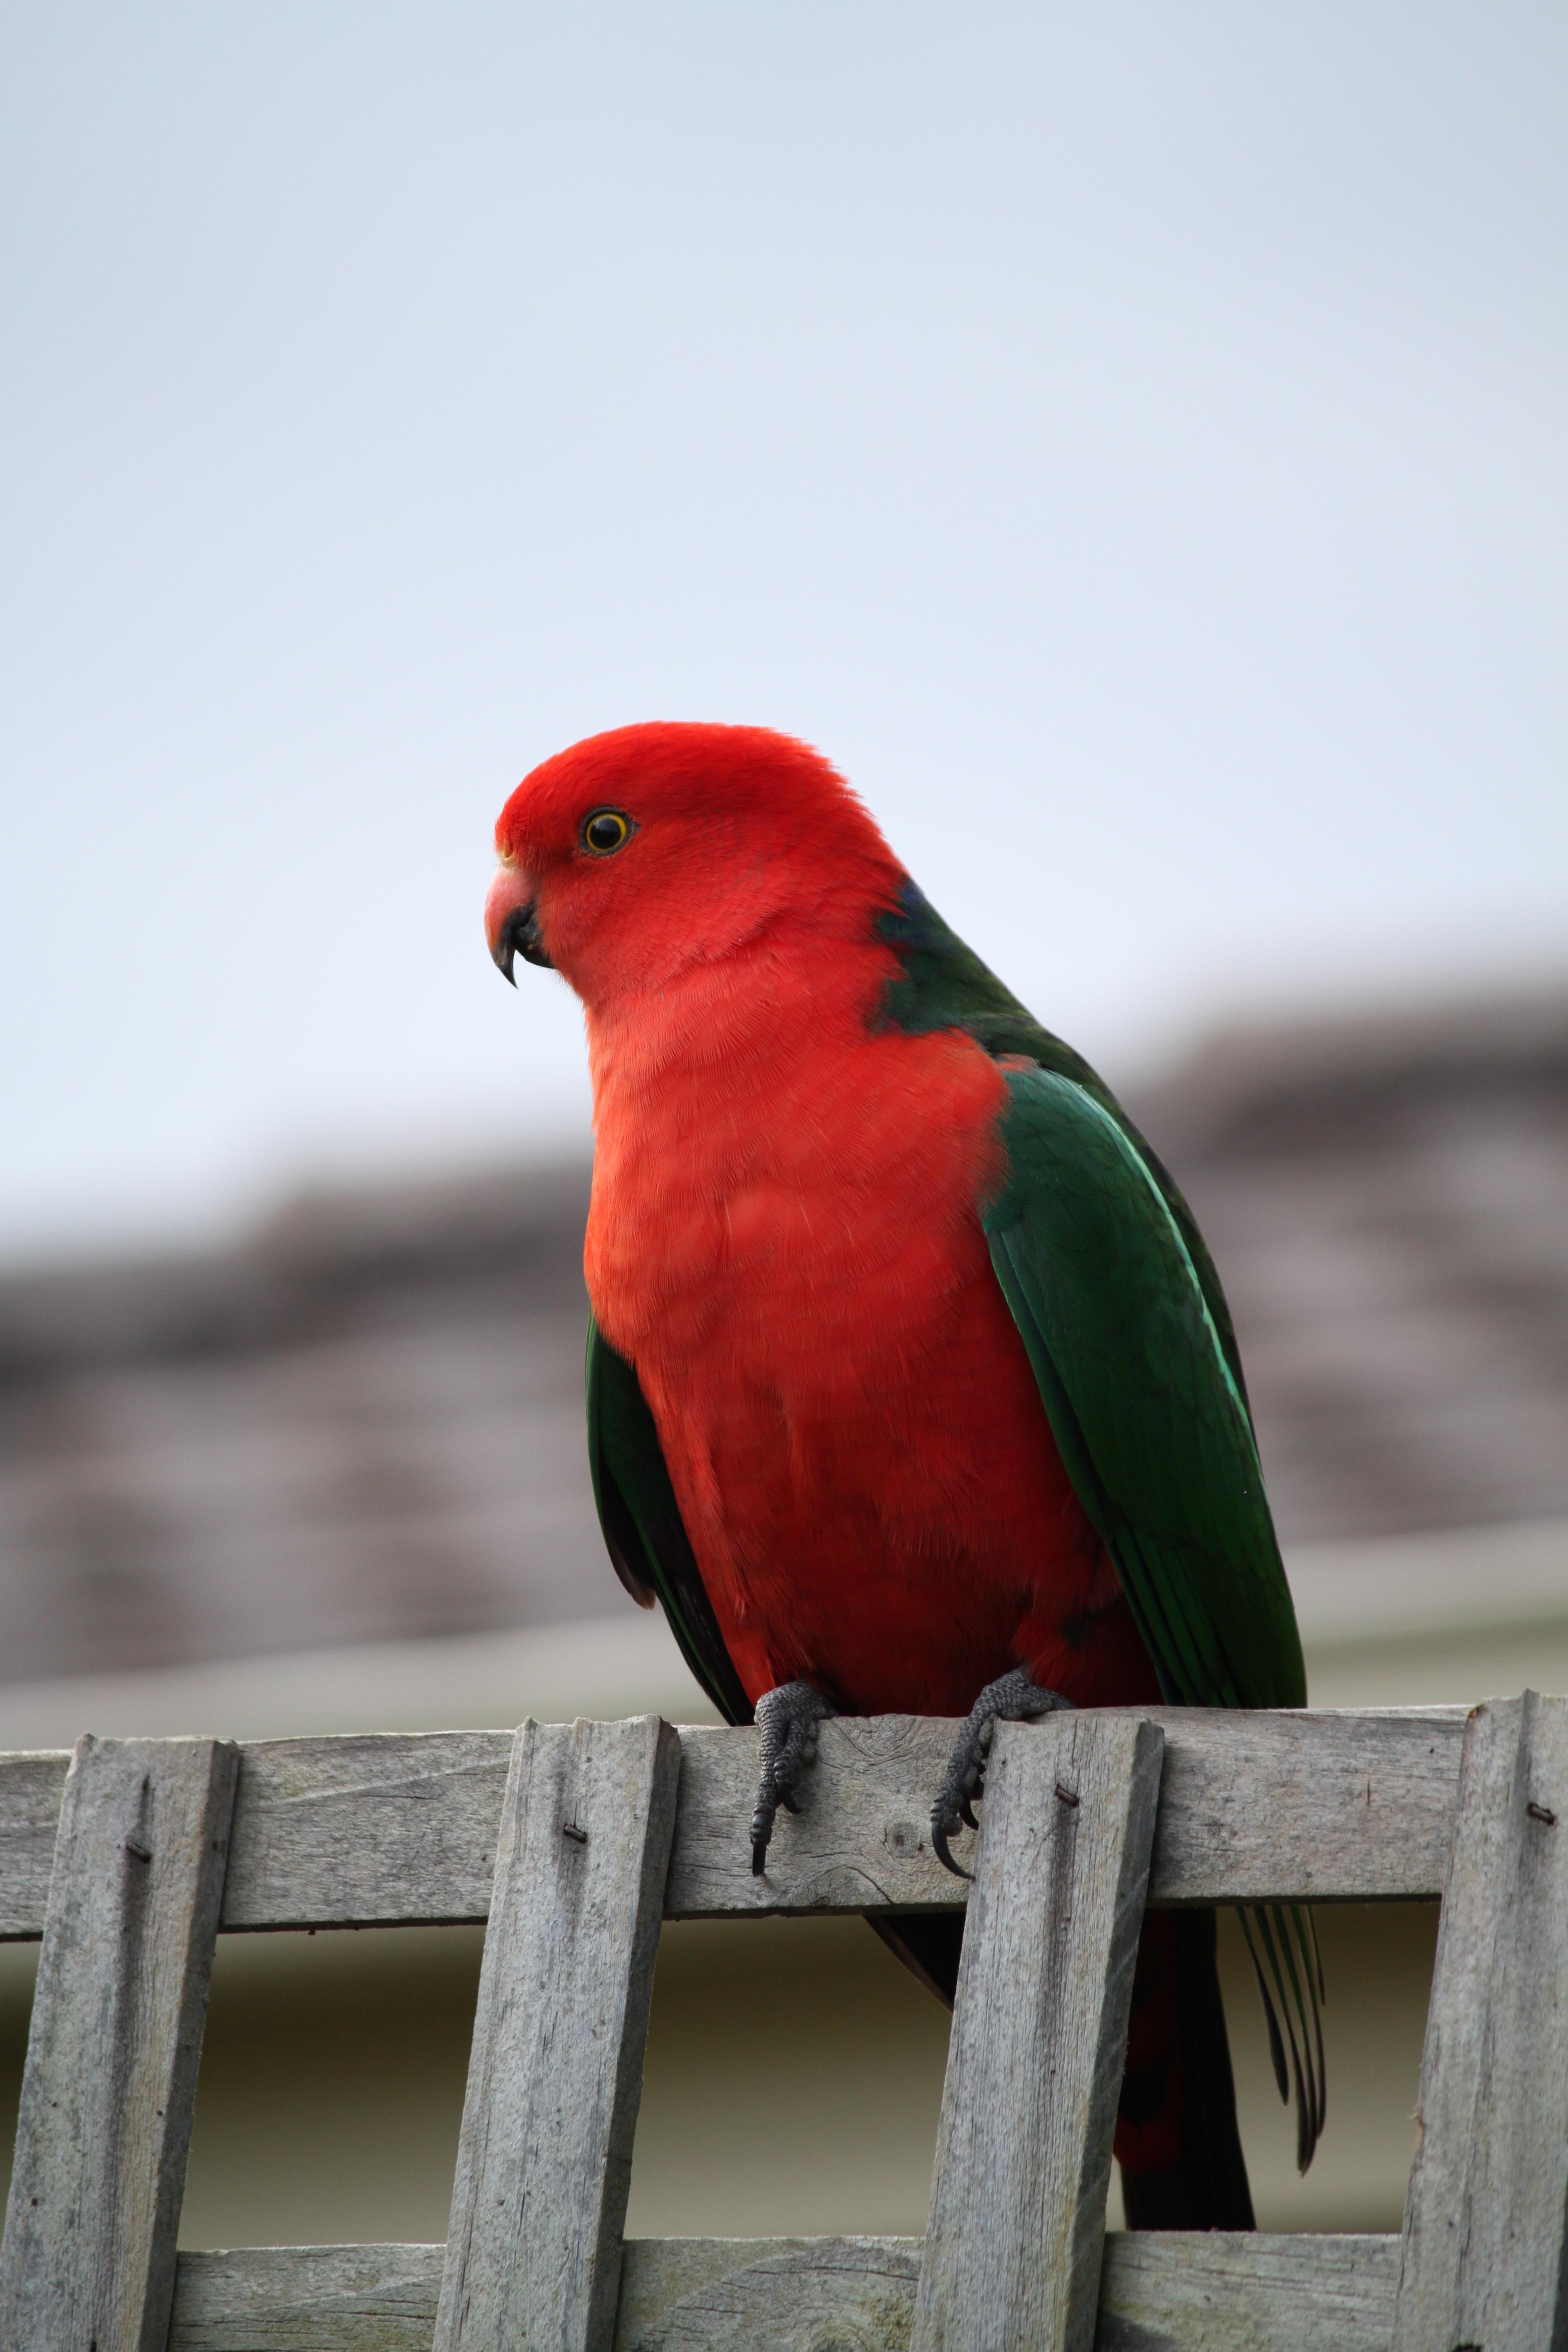 free images bird wing animal wildlife red beak colourful